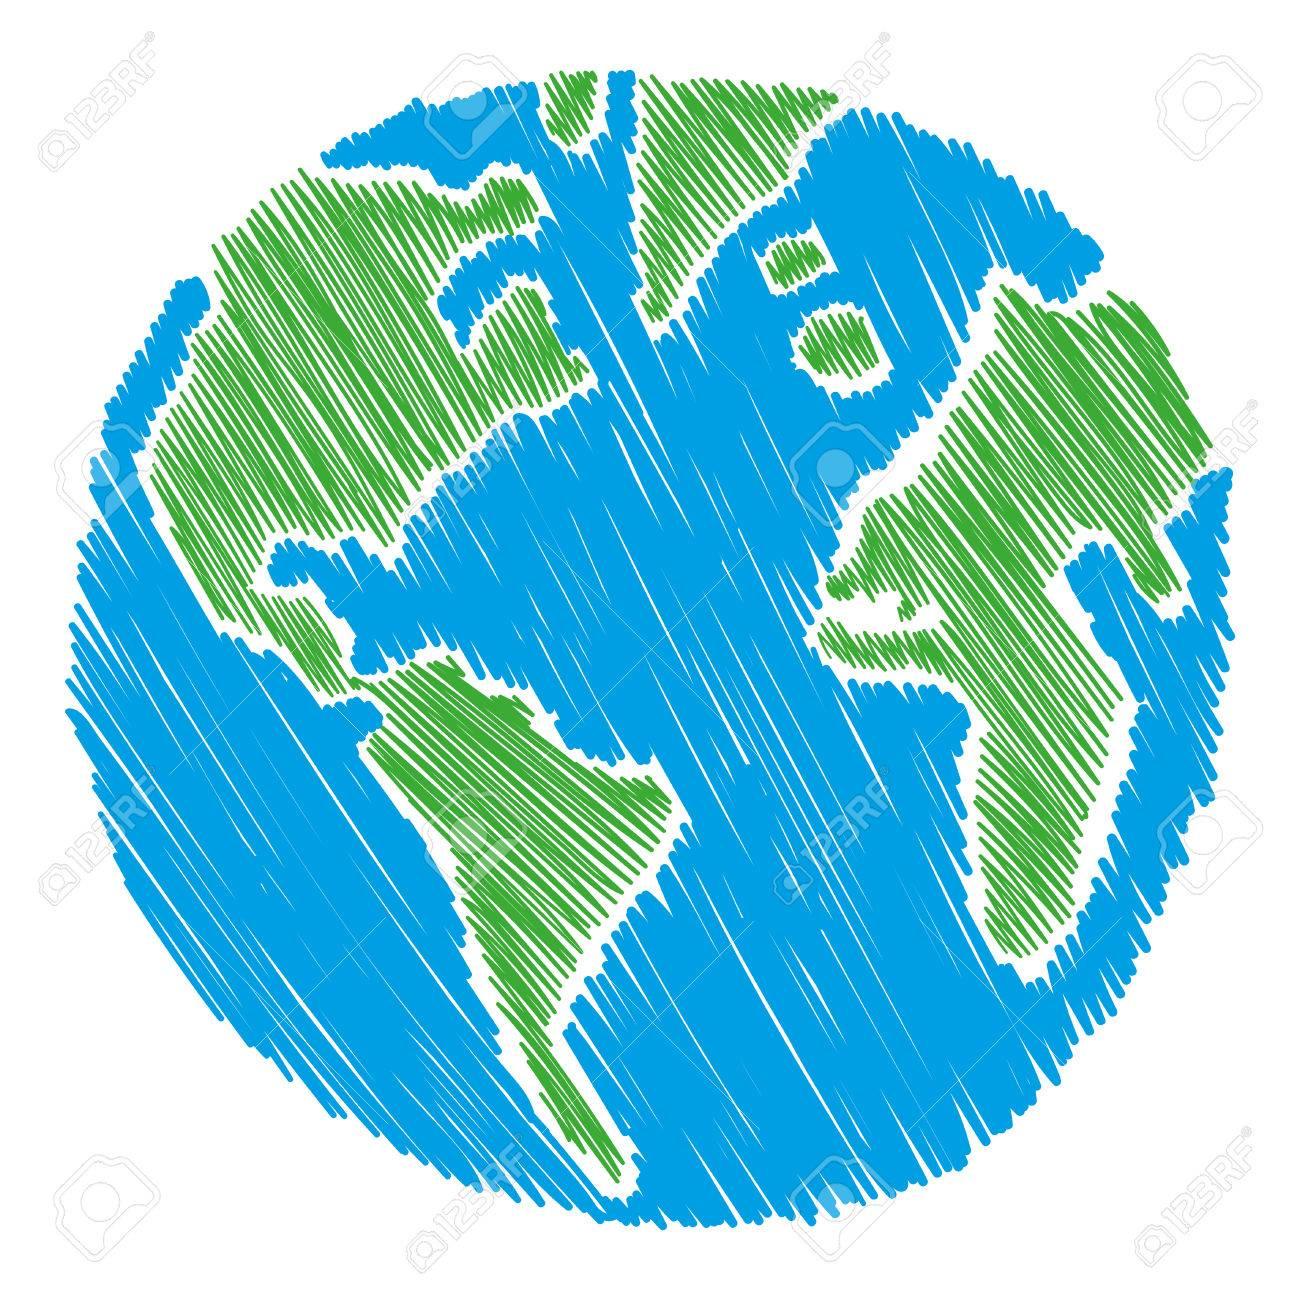 earth vector illustration royalty free cliparts vectors and stock rh 123rf com vector earth logo vector earthquake